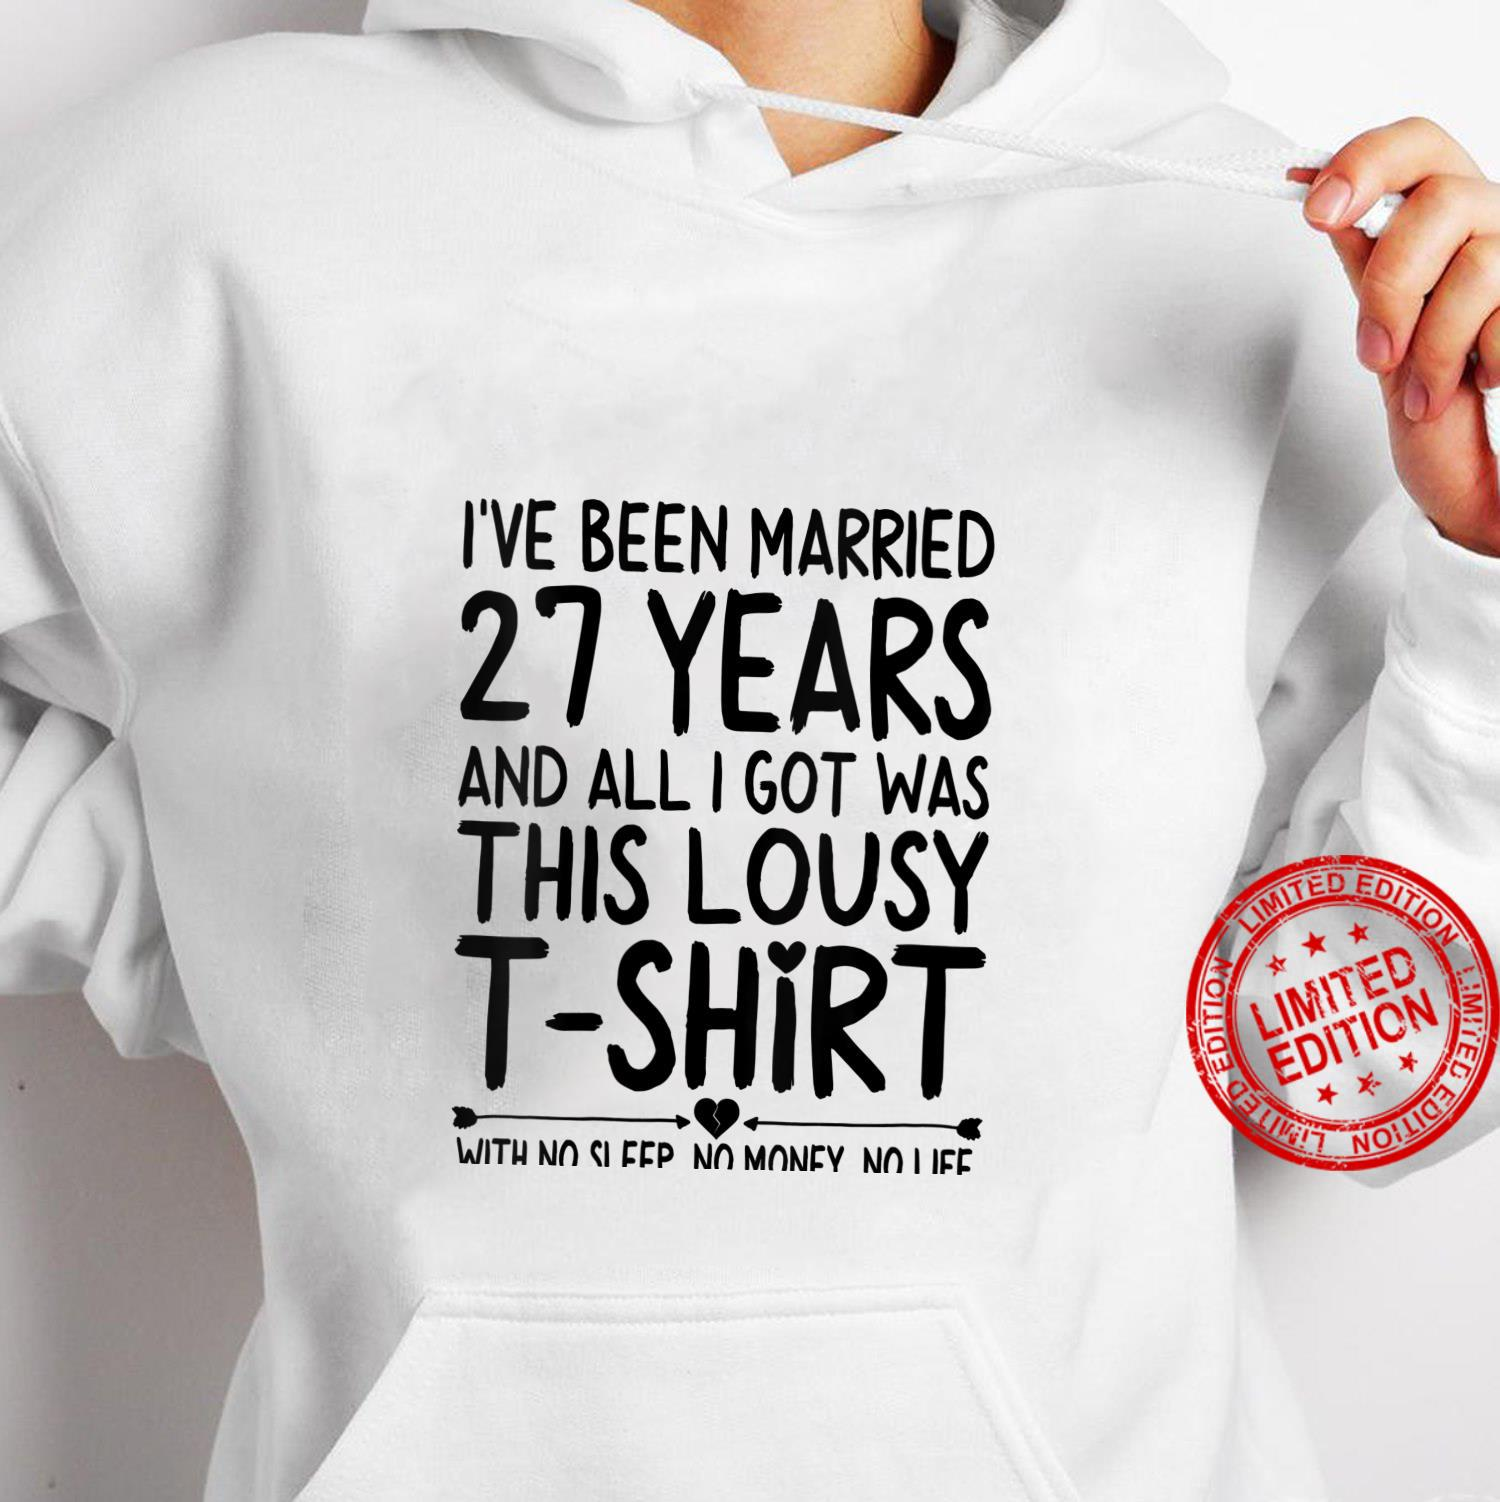 Womens 27th Wedding Anniversary Shirt for Her & Him Humor Marriage Shirt hoodie